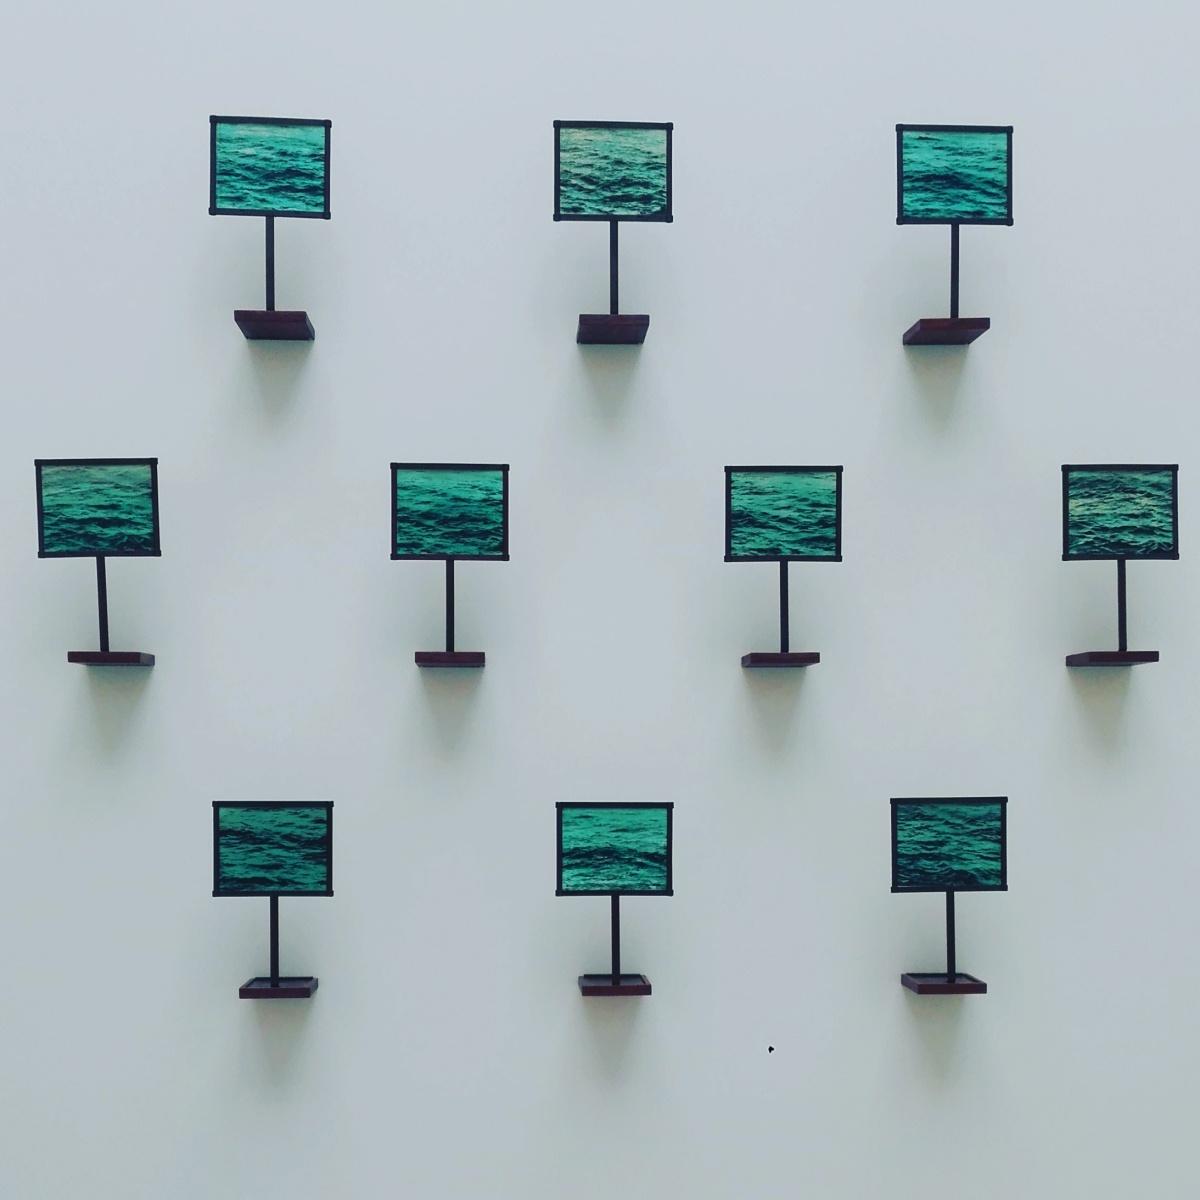 Biennale Arte 2017 - Padiglione Centrale (Giardini): Hajra Waheed (Canada)